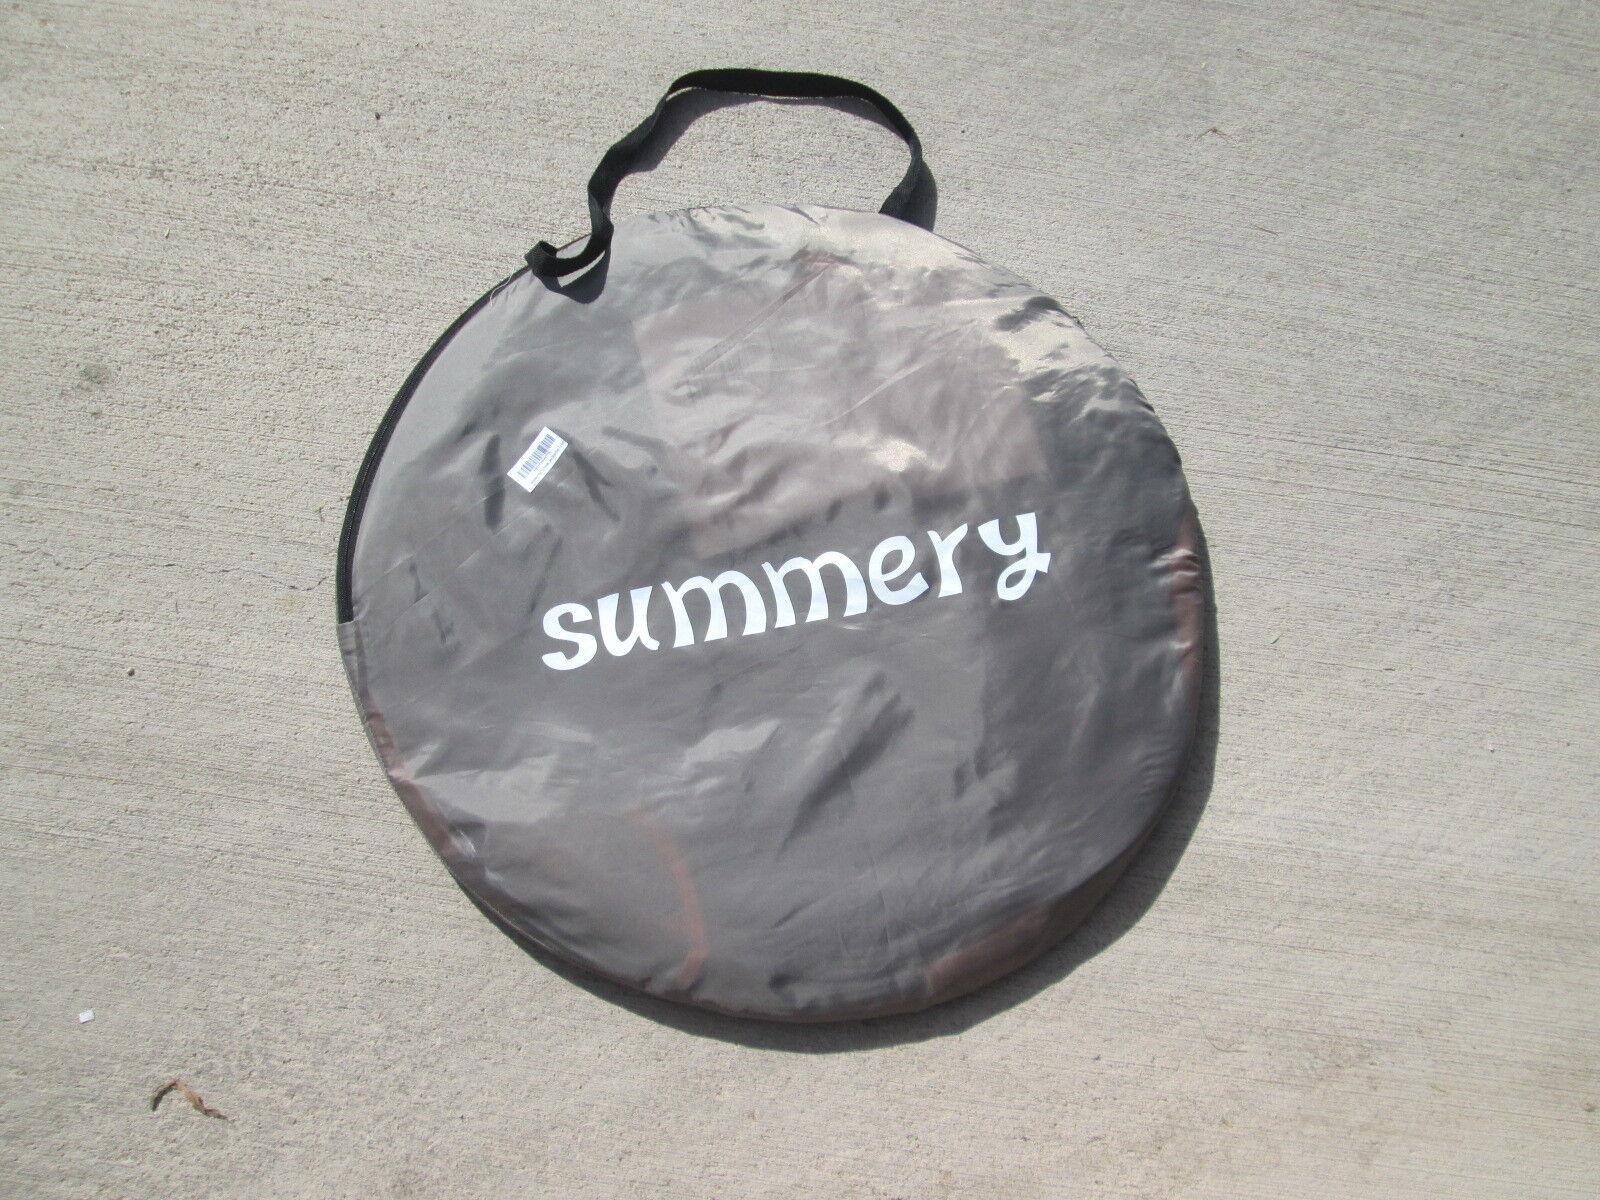 Summery POP-UP Tent Sleeps 1 Base  7'3  x 3'6  Height  3'